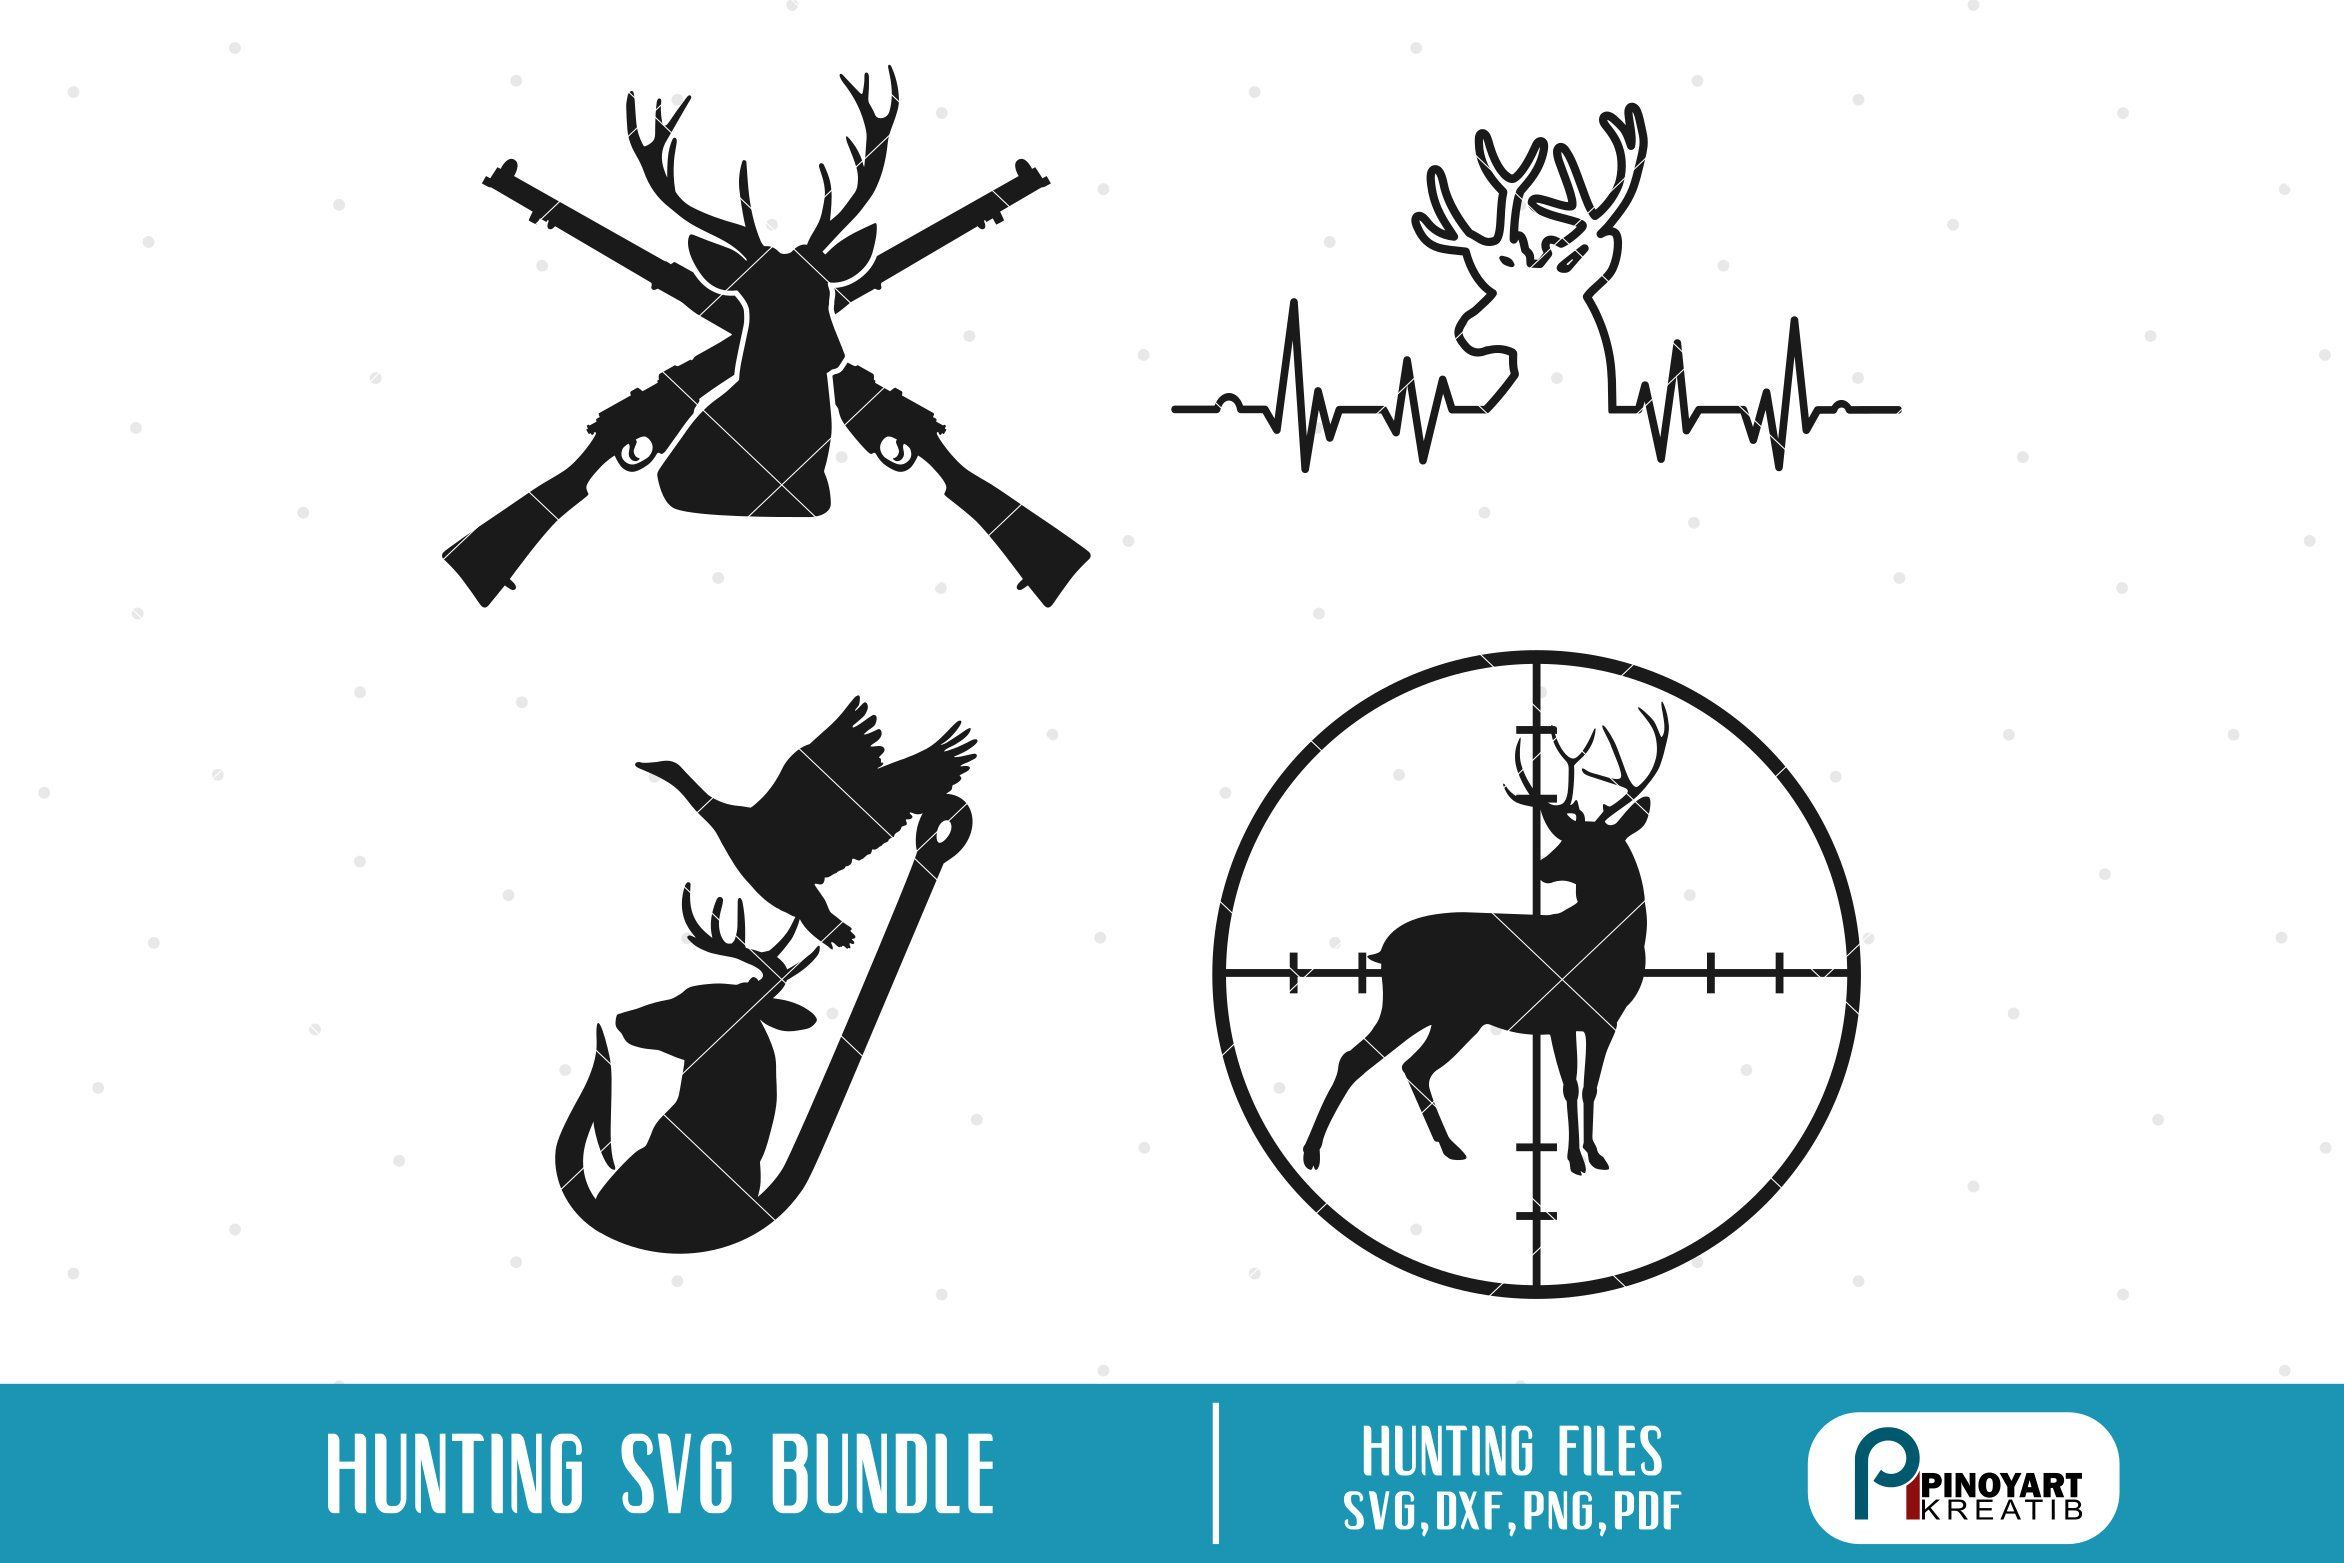 Deer svg, Deer Heartbeat svg, Deer in Scope svg, Hunting